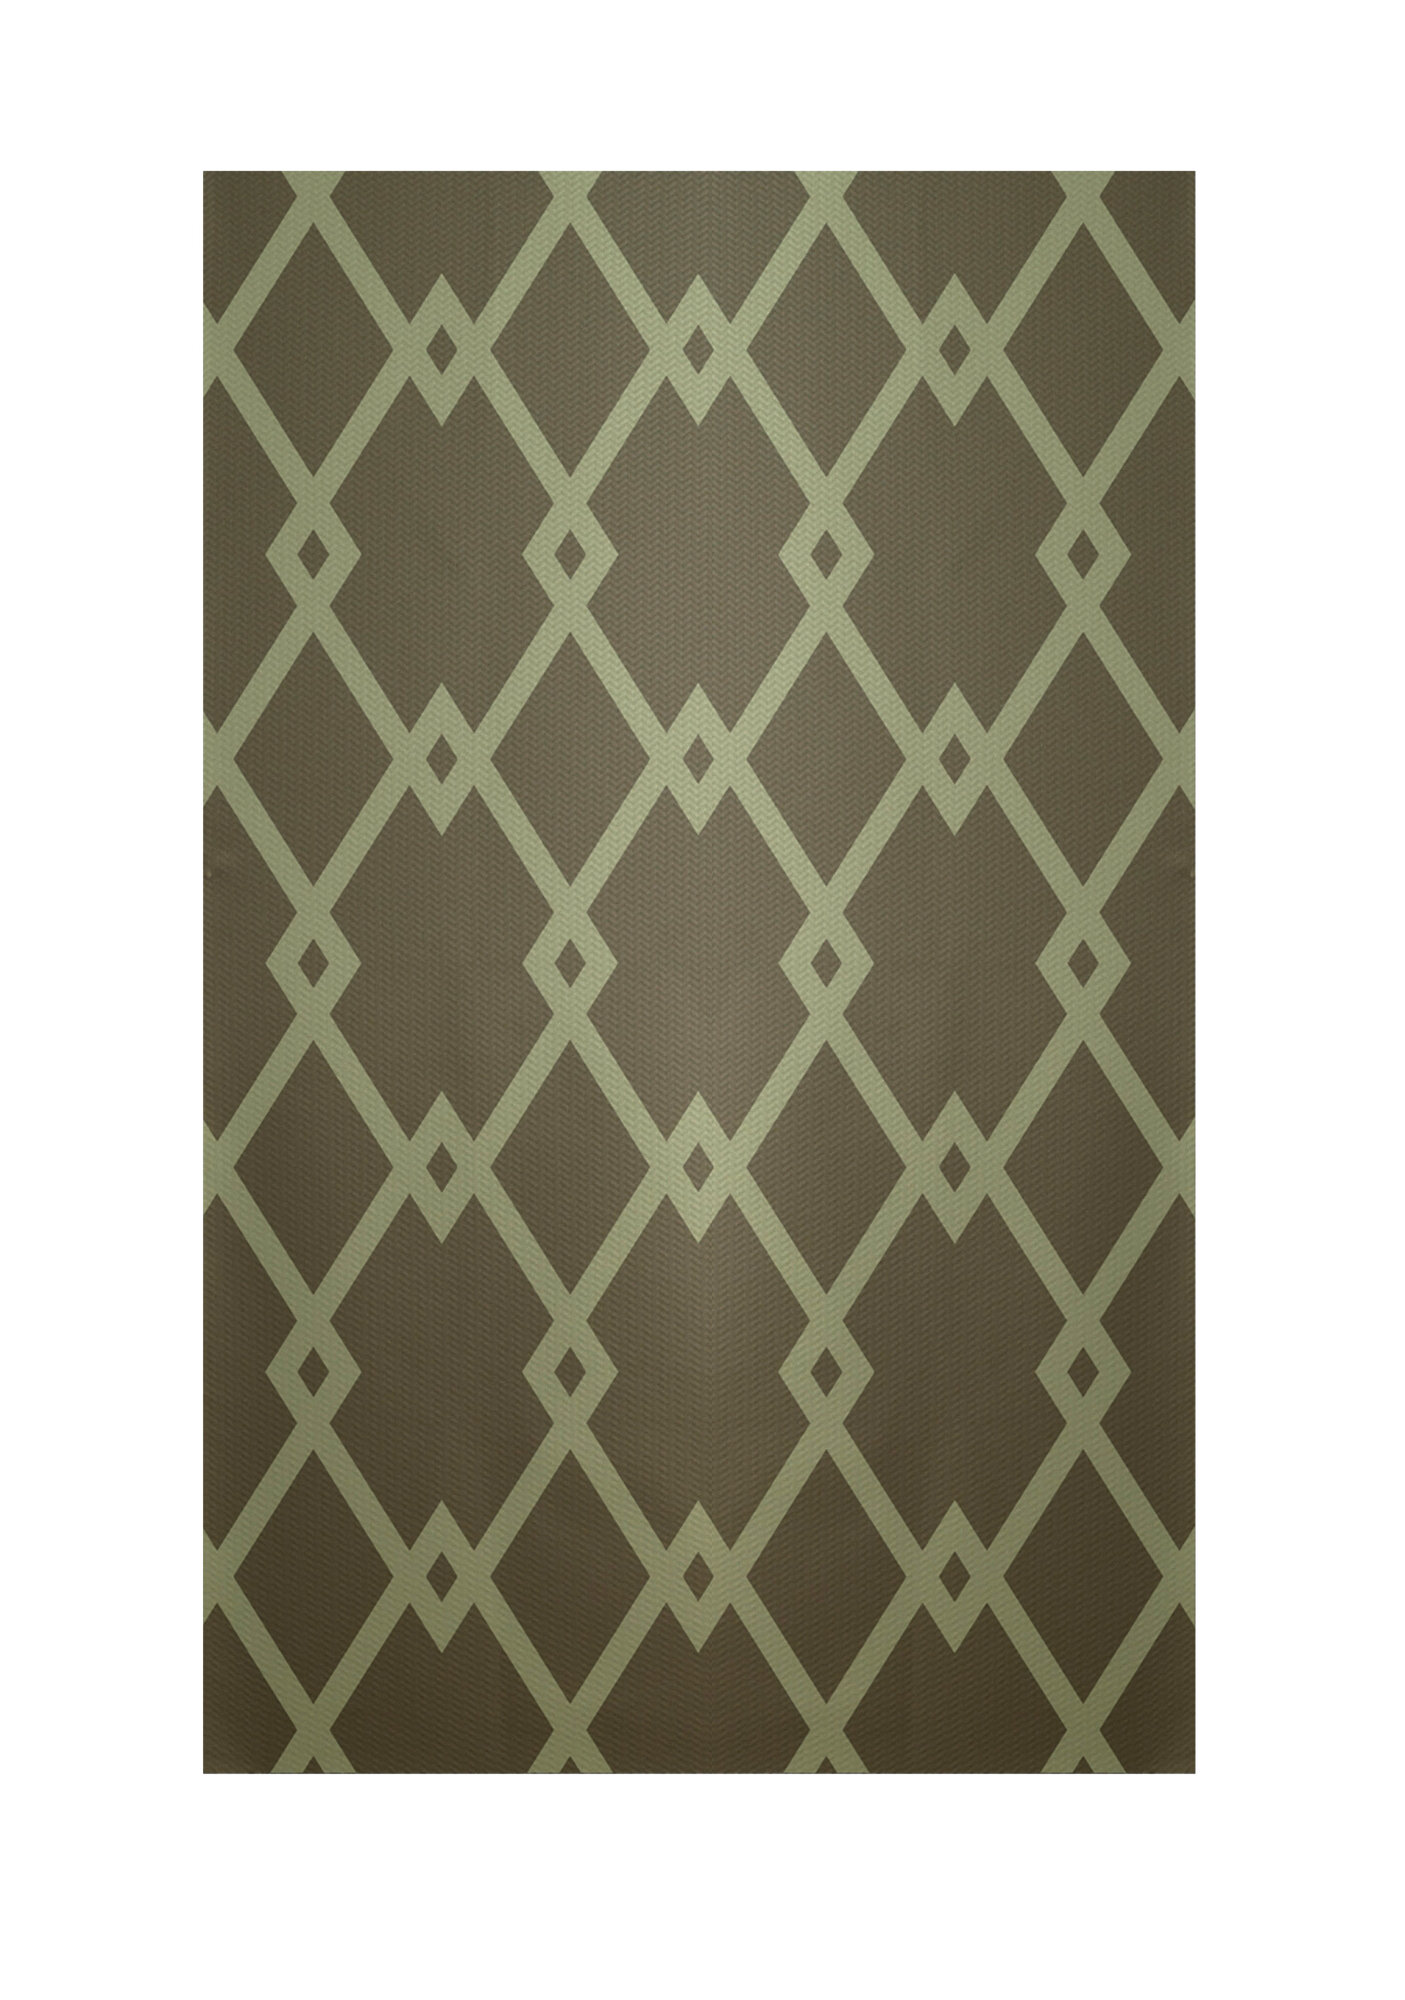 e by design decorative geometric sage green area rug ebay. Black Bedroom Furniture Sets. Home Design Ideas